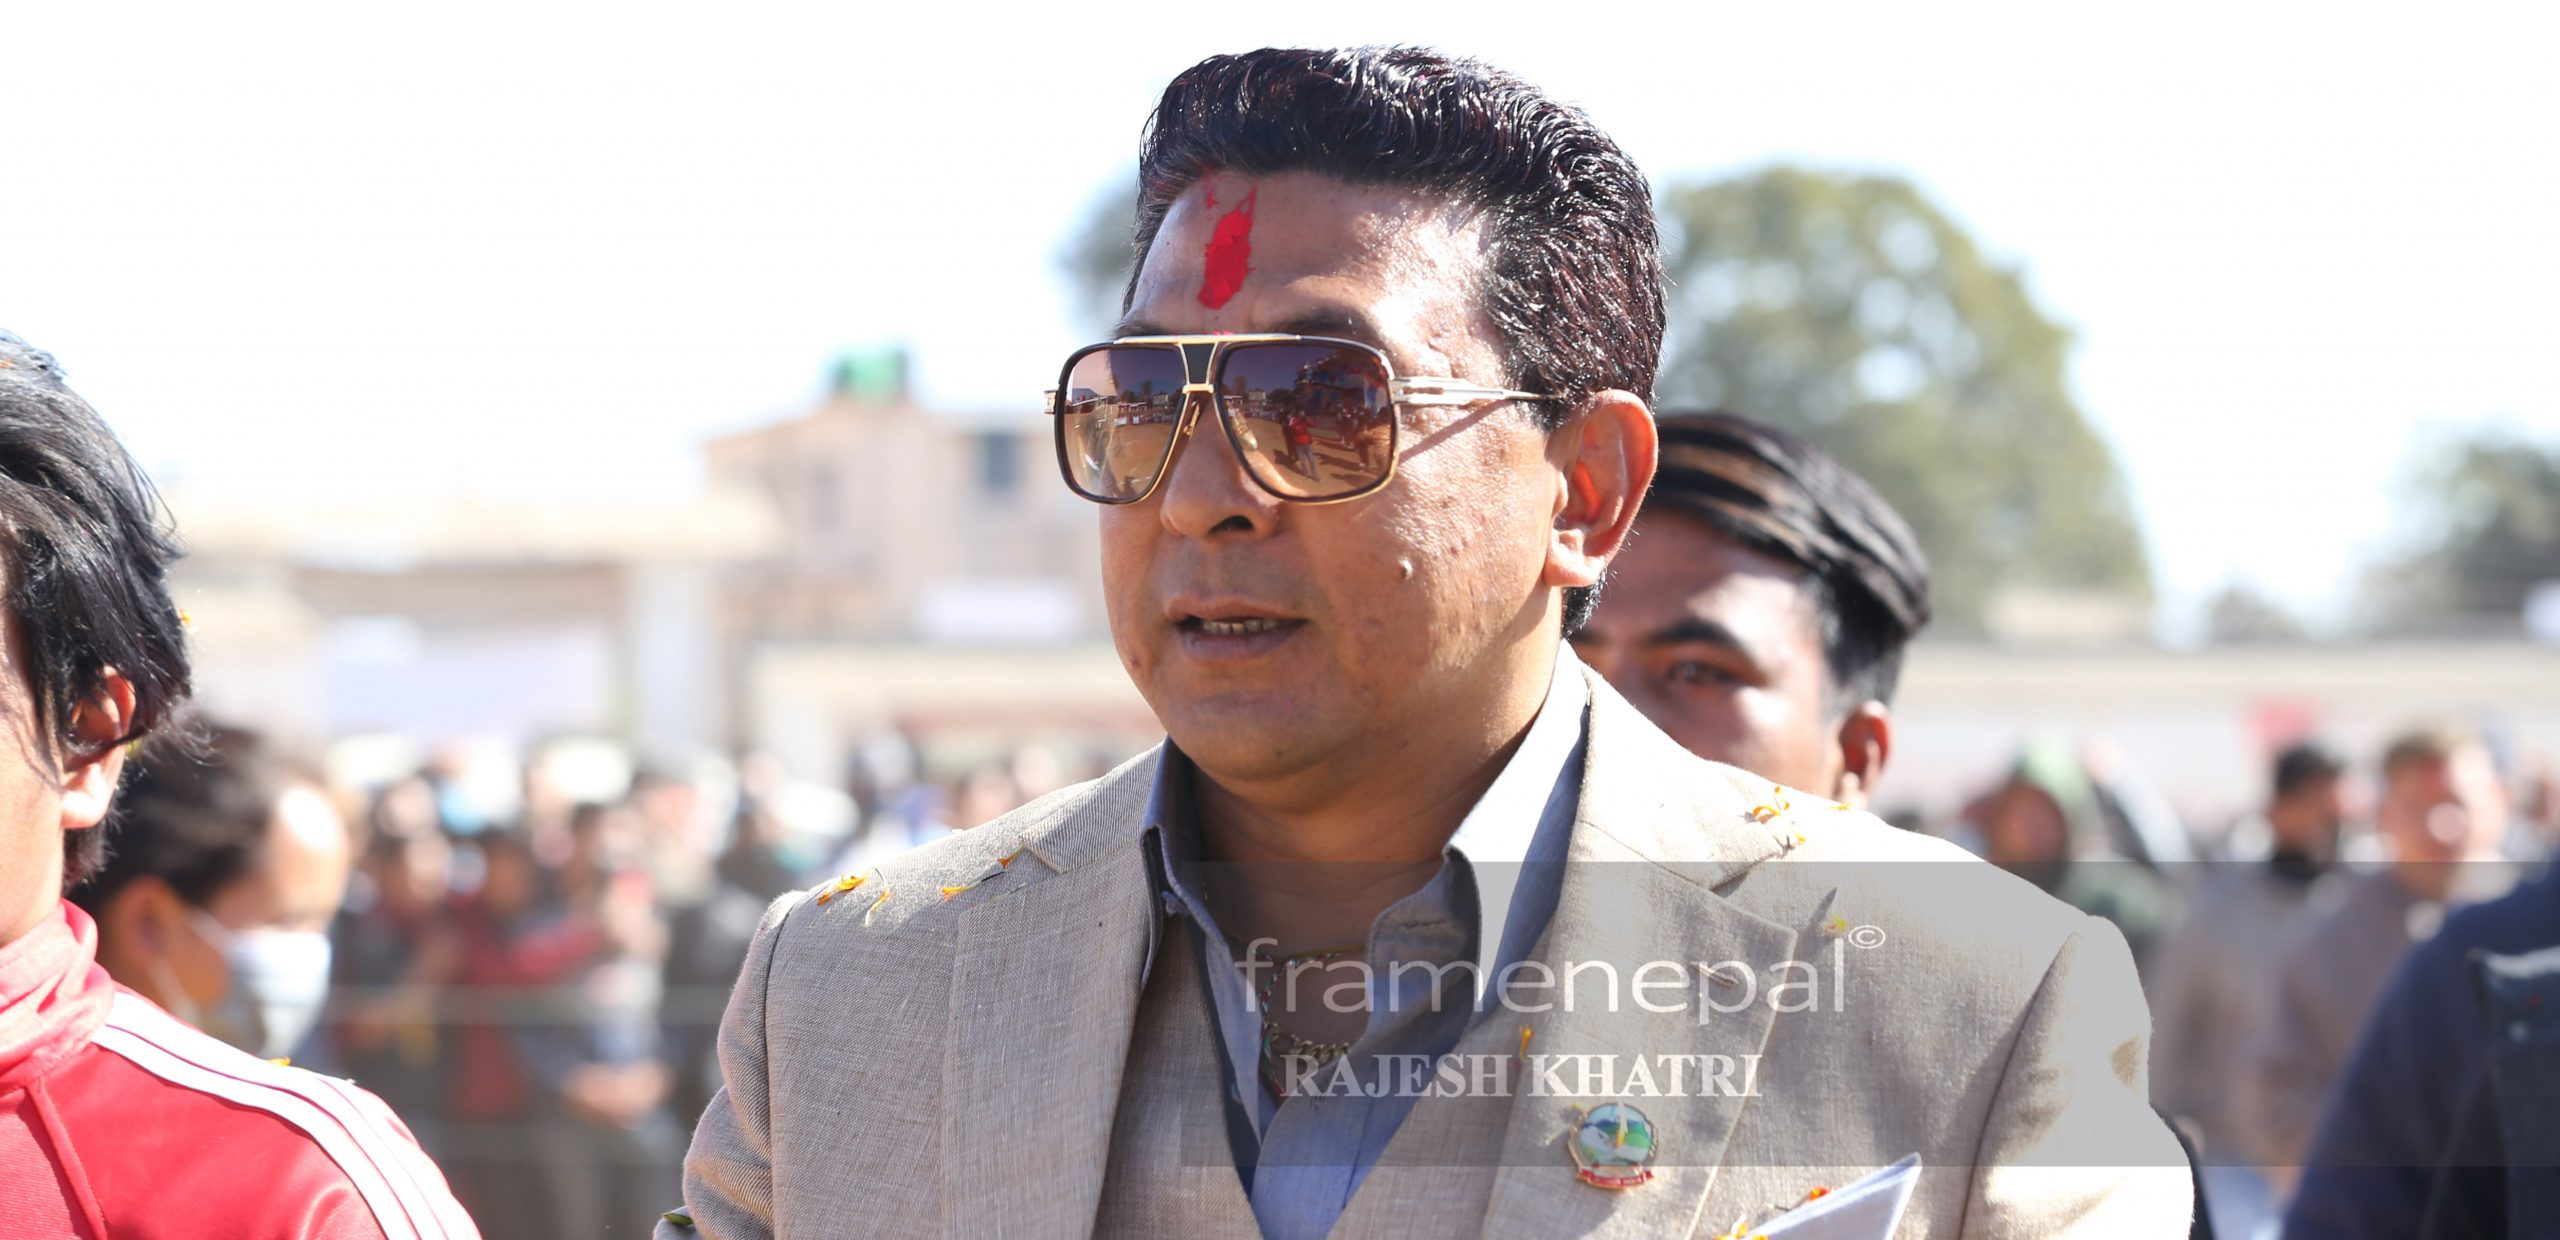 Deepak Manange,Best Photo, Rajiv Gurung,Best Photo Deepak Manange, is a Nepali gangster and politician, who was elected to Gandaki Provincial Assembly in the 2017, Provincial Assembly member Deepak Manange, deepak manange son, chakre milan, deepak manange wife, deepak manange biography, deepak manange family, deepak manange net worth, don of nepal, ganesh lama,